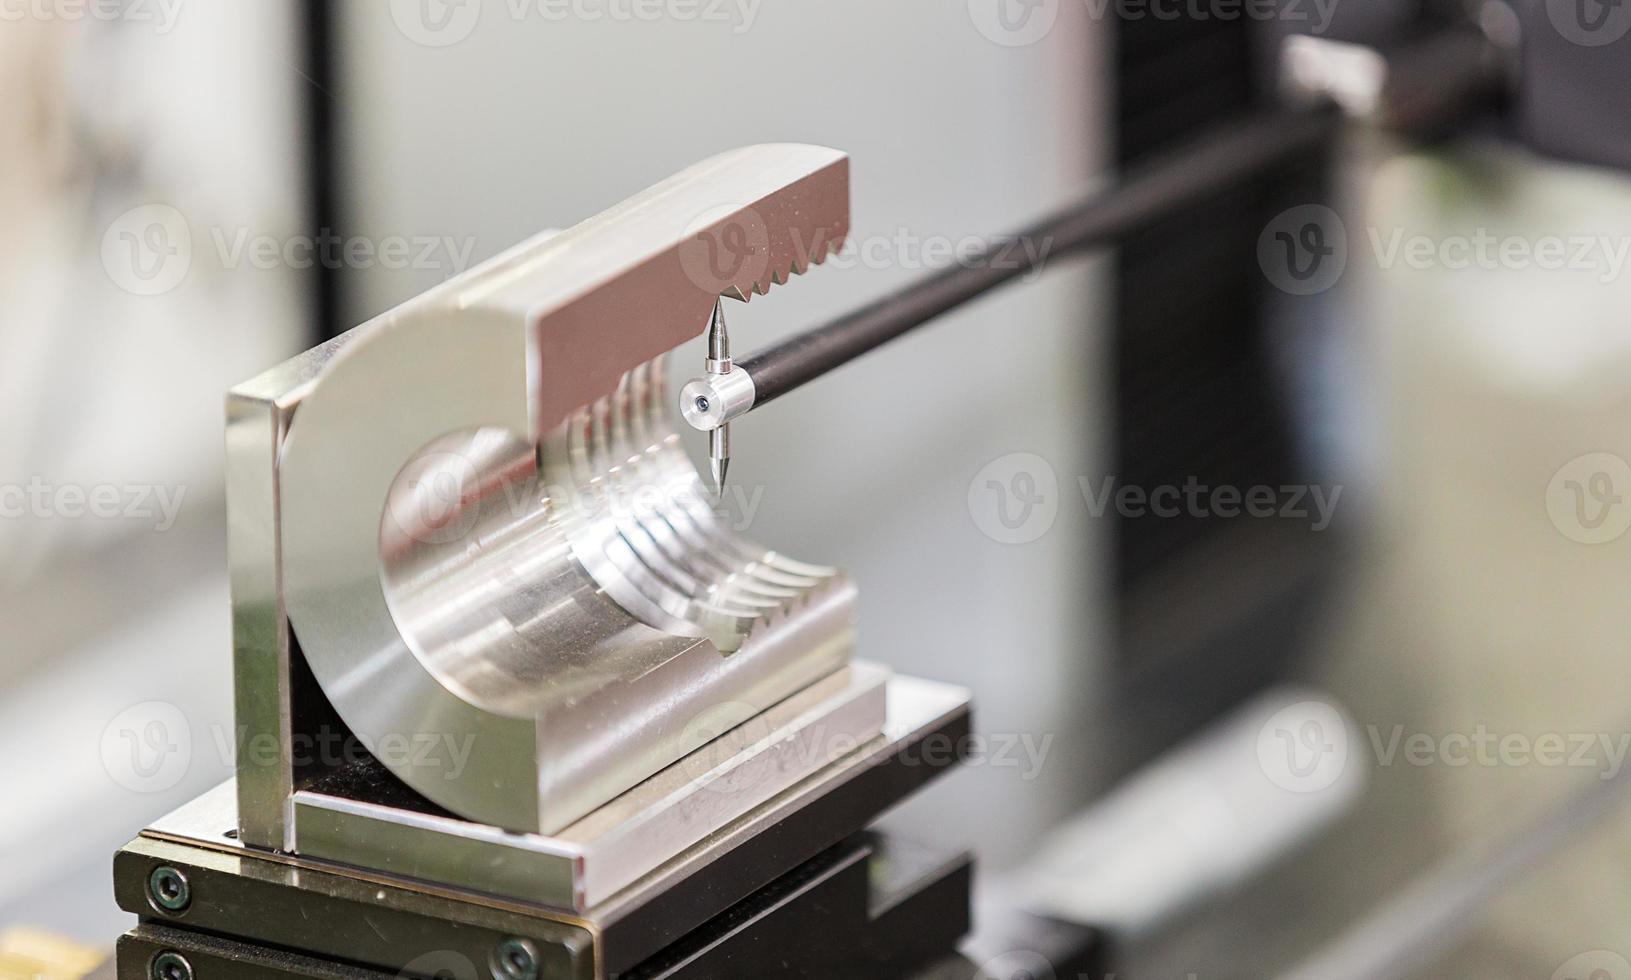 operator inspection automotive part by contour measuring machine photo